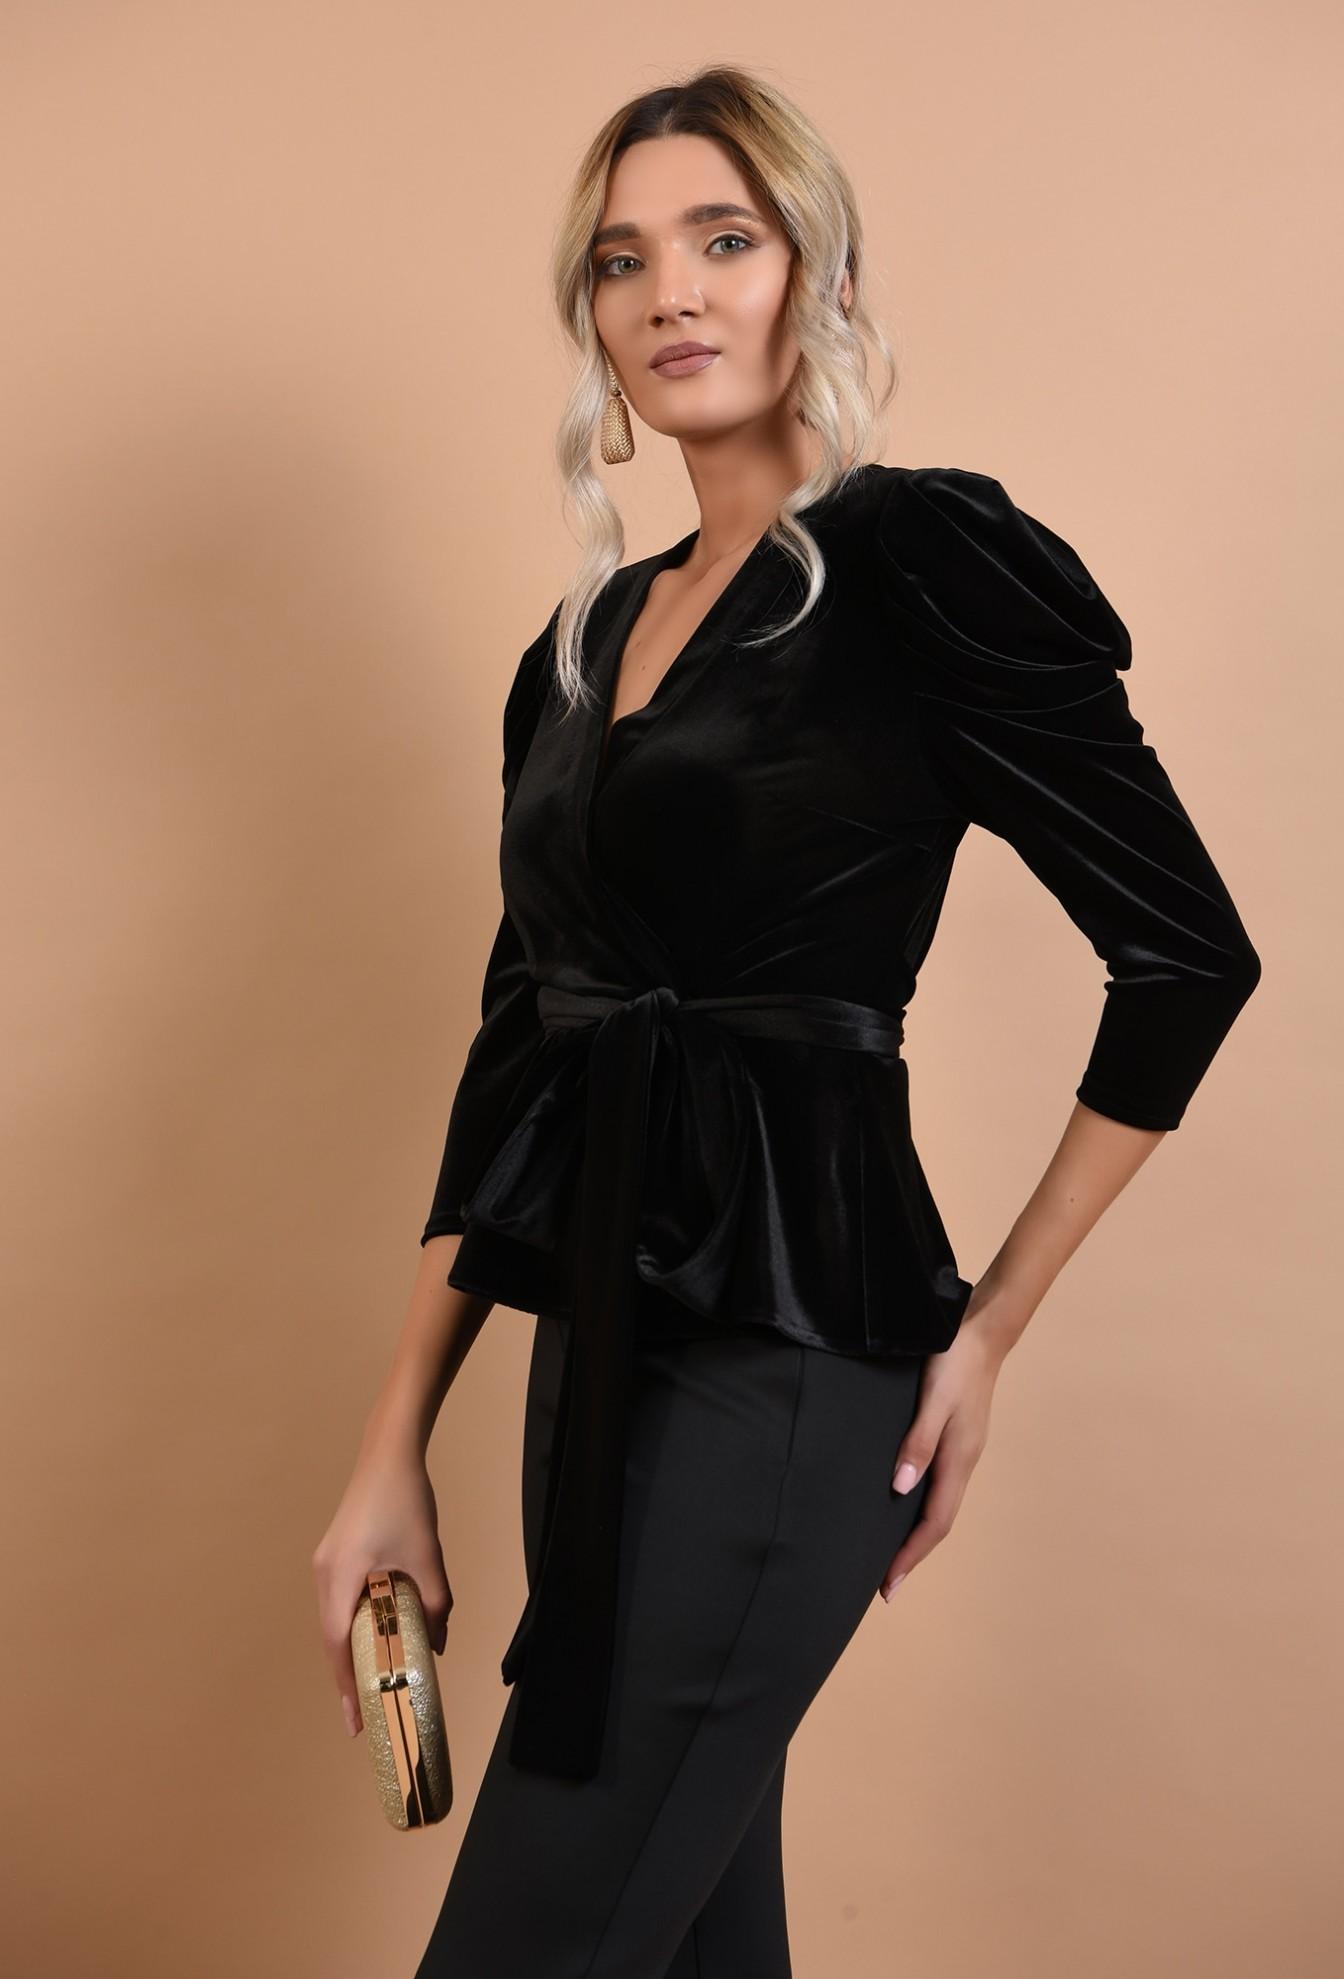 0 - bluza eleganta, cu maneci lungi, cordon la talie, decolteu anchior